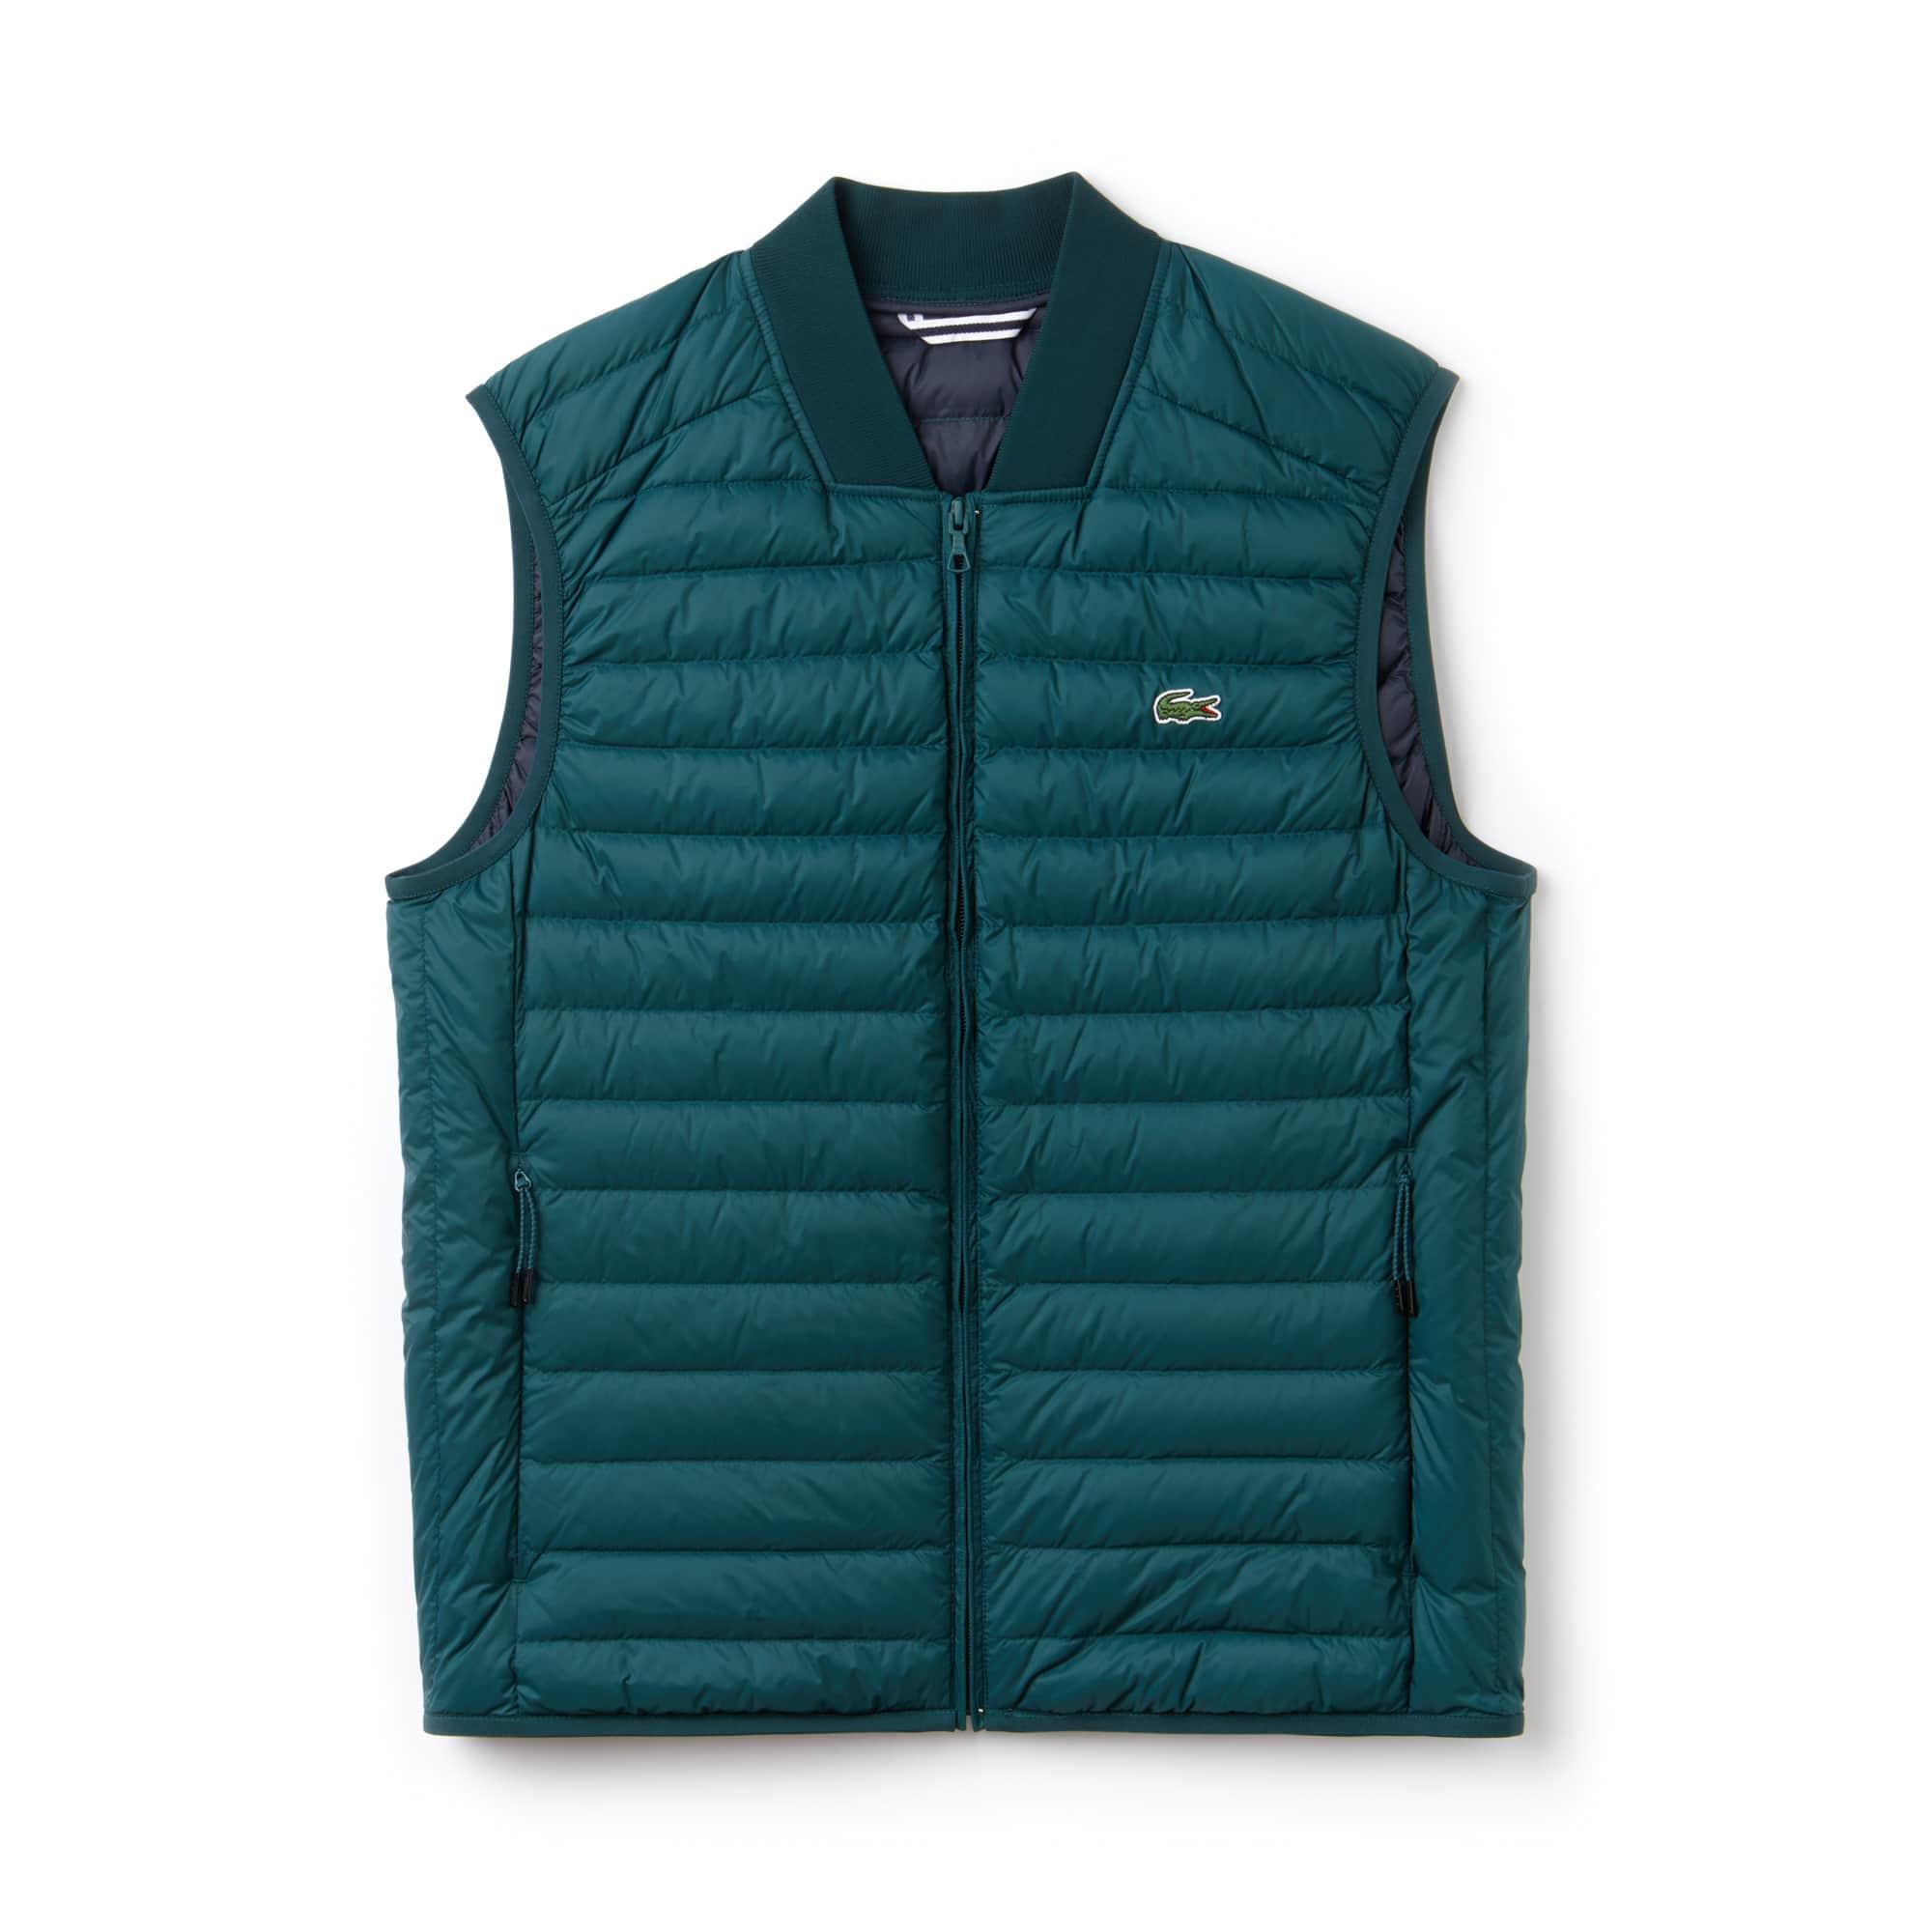 Men's Short Contrast Lining Quilted Vest